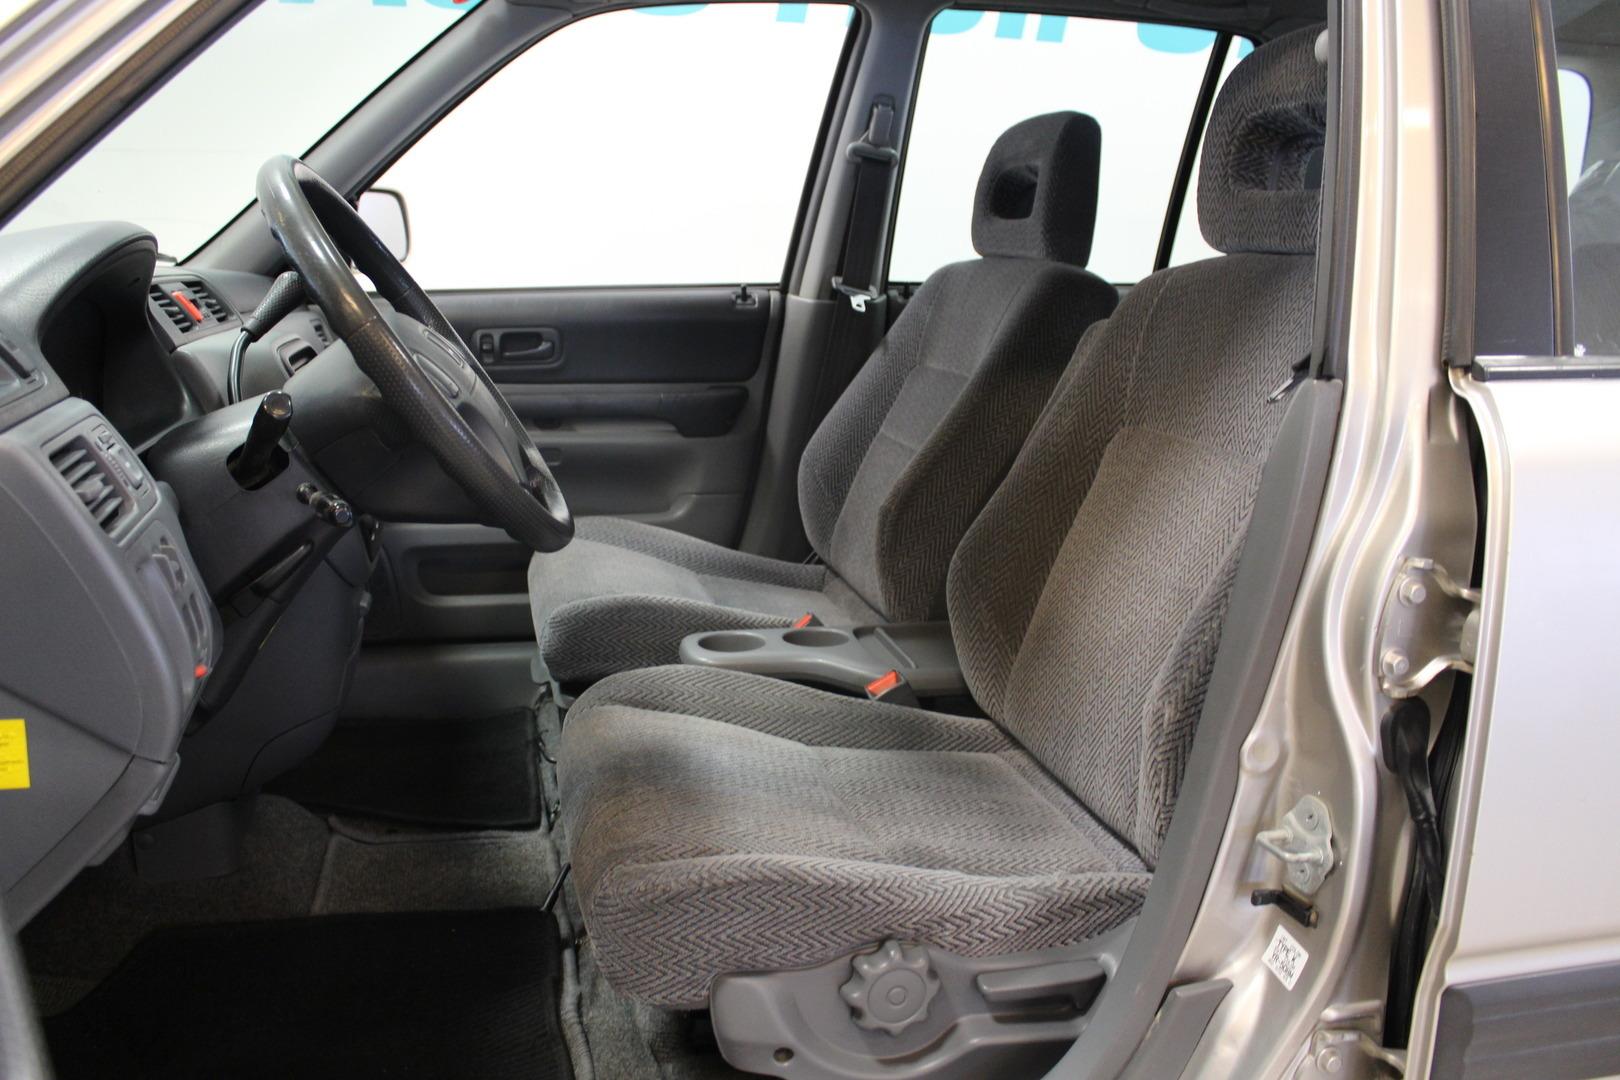 Honda CR-V, 2,0l 4x4 Automaatti **Juuri tullut** #Neliveto #Työjuhta